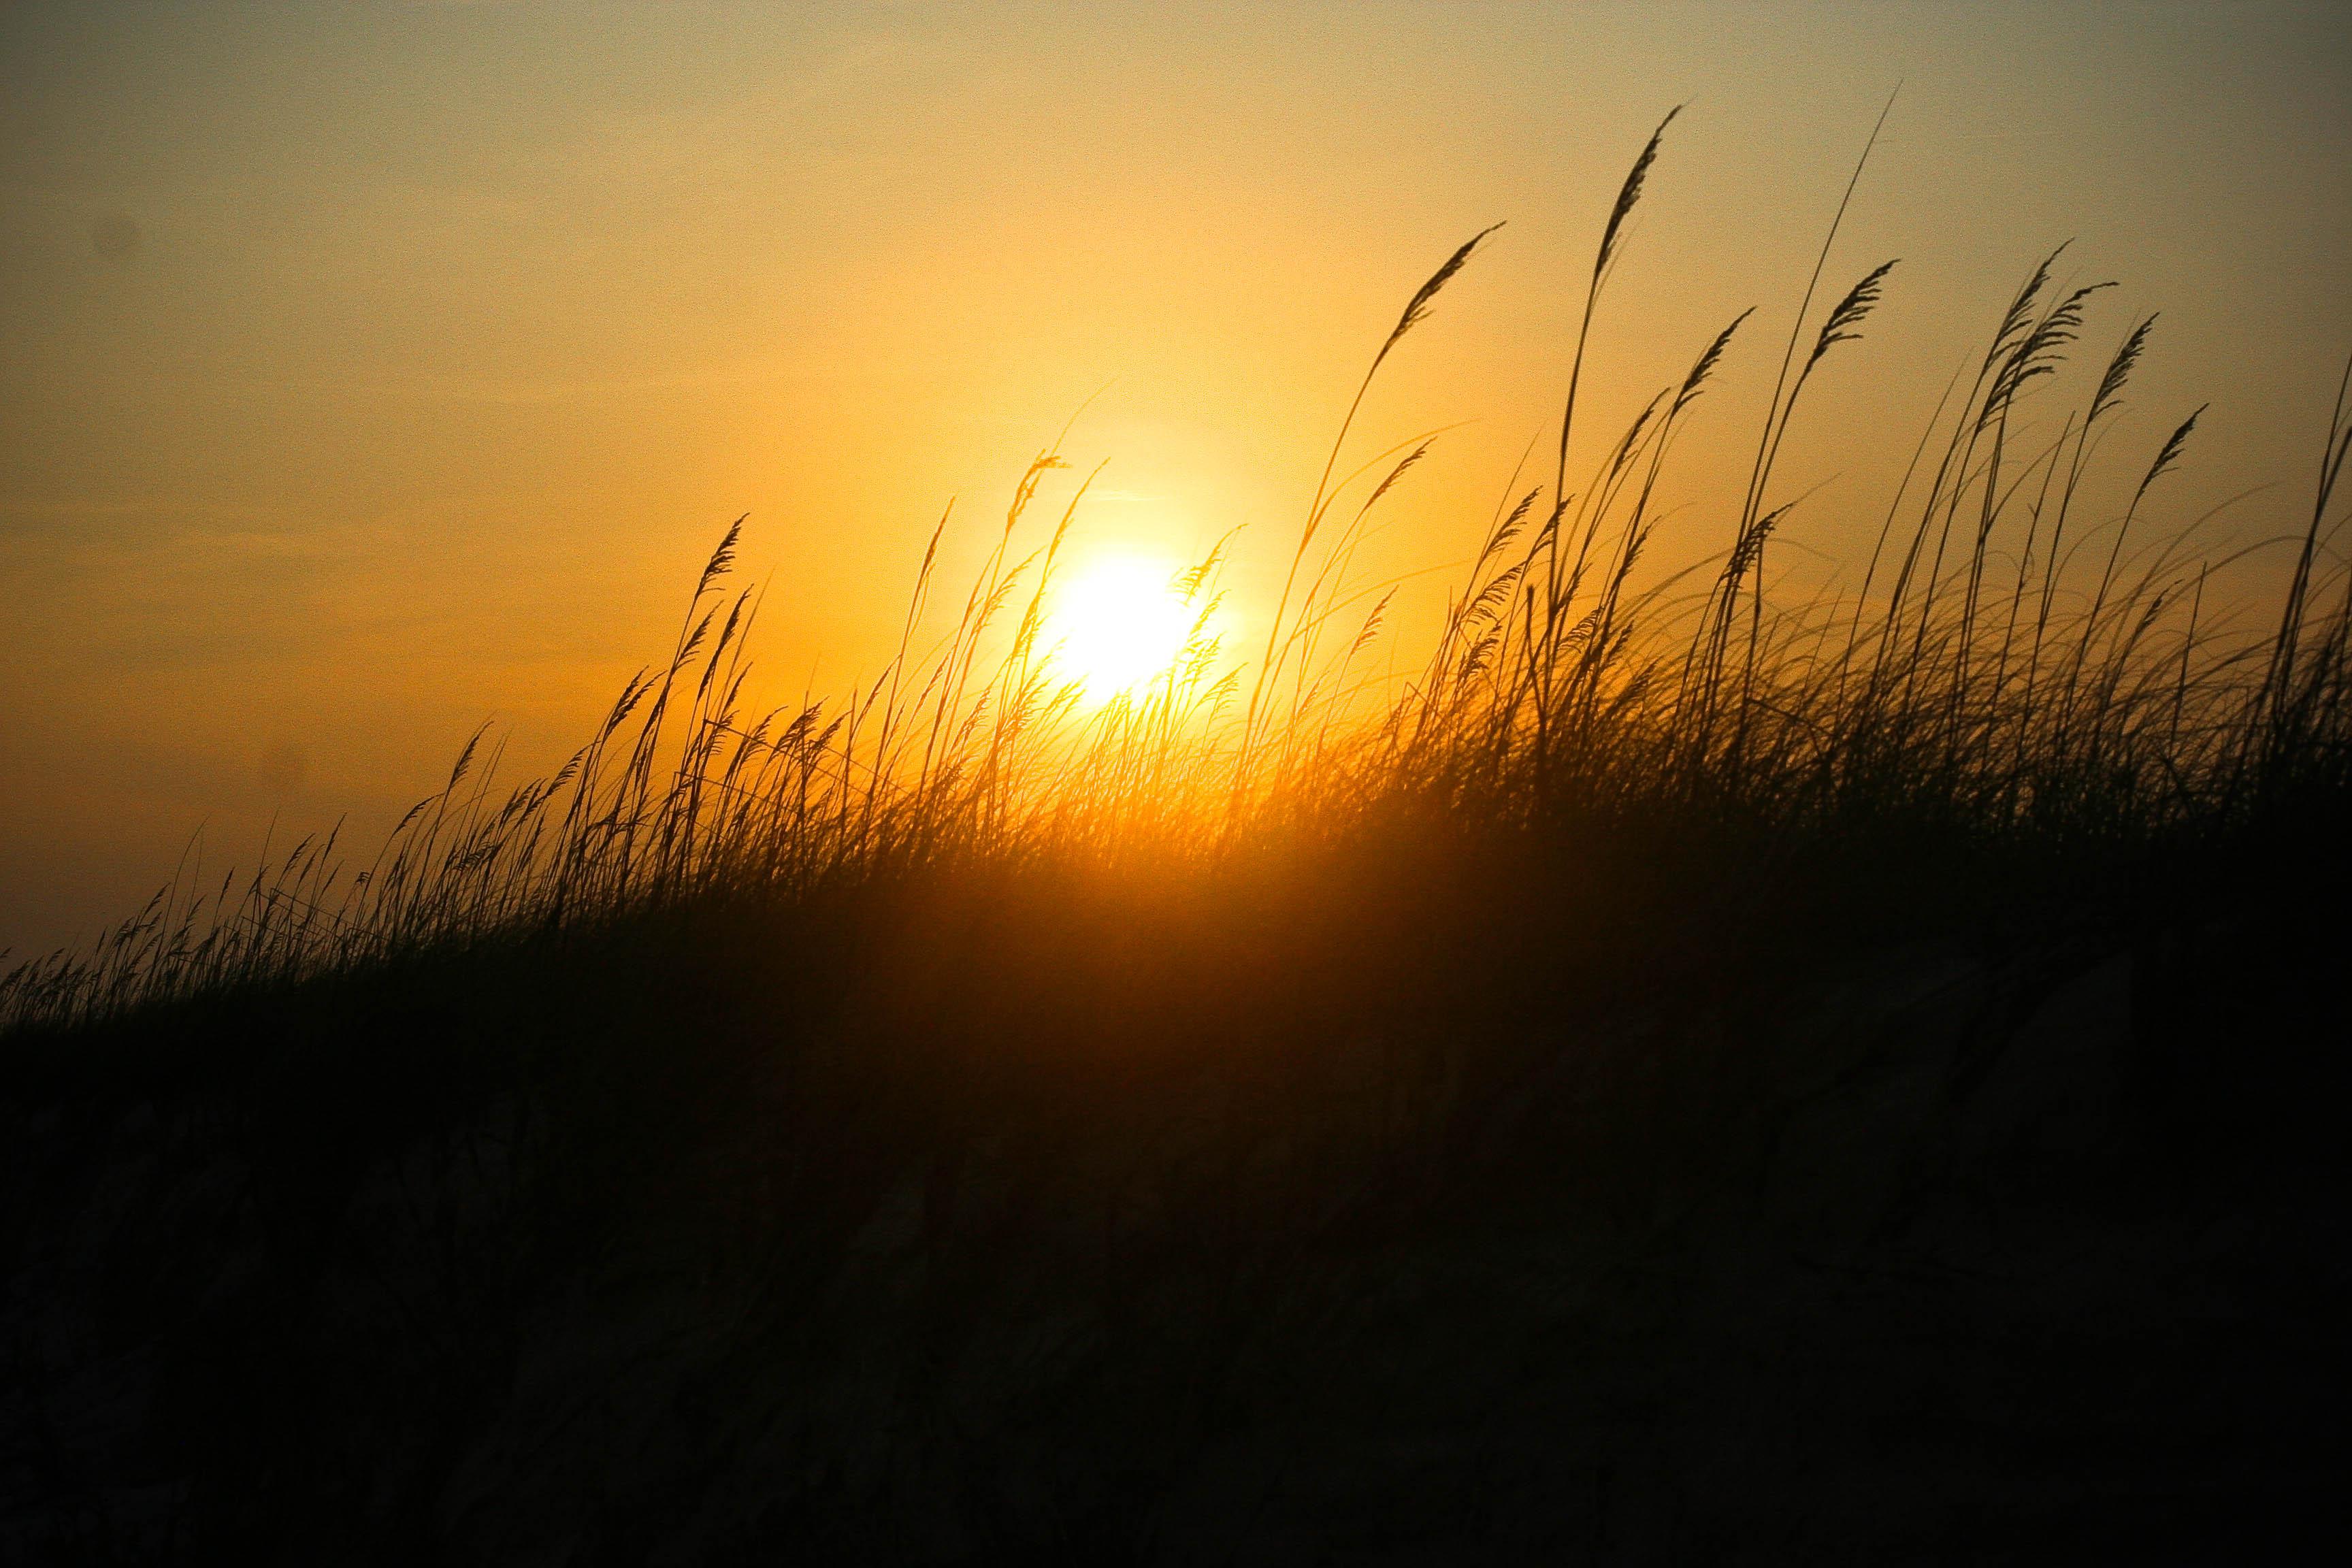 sunset beauty3